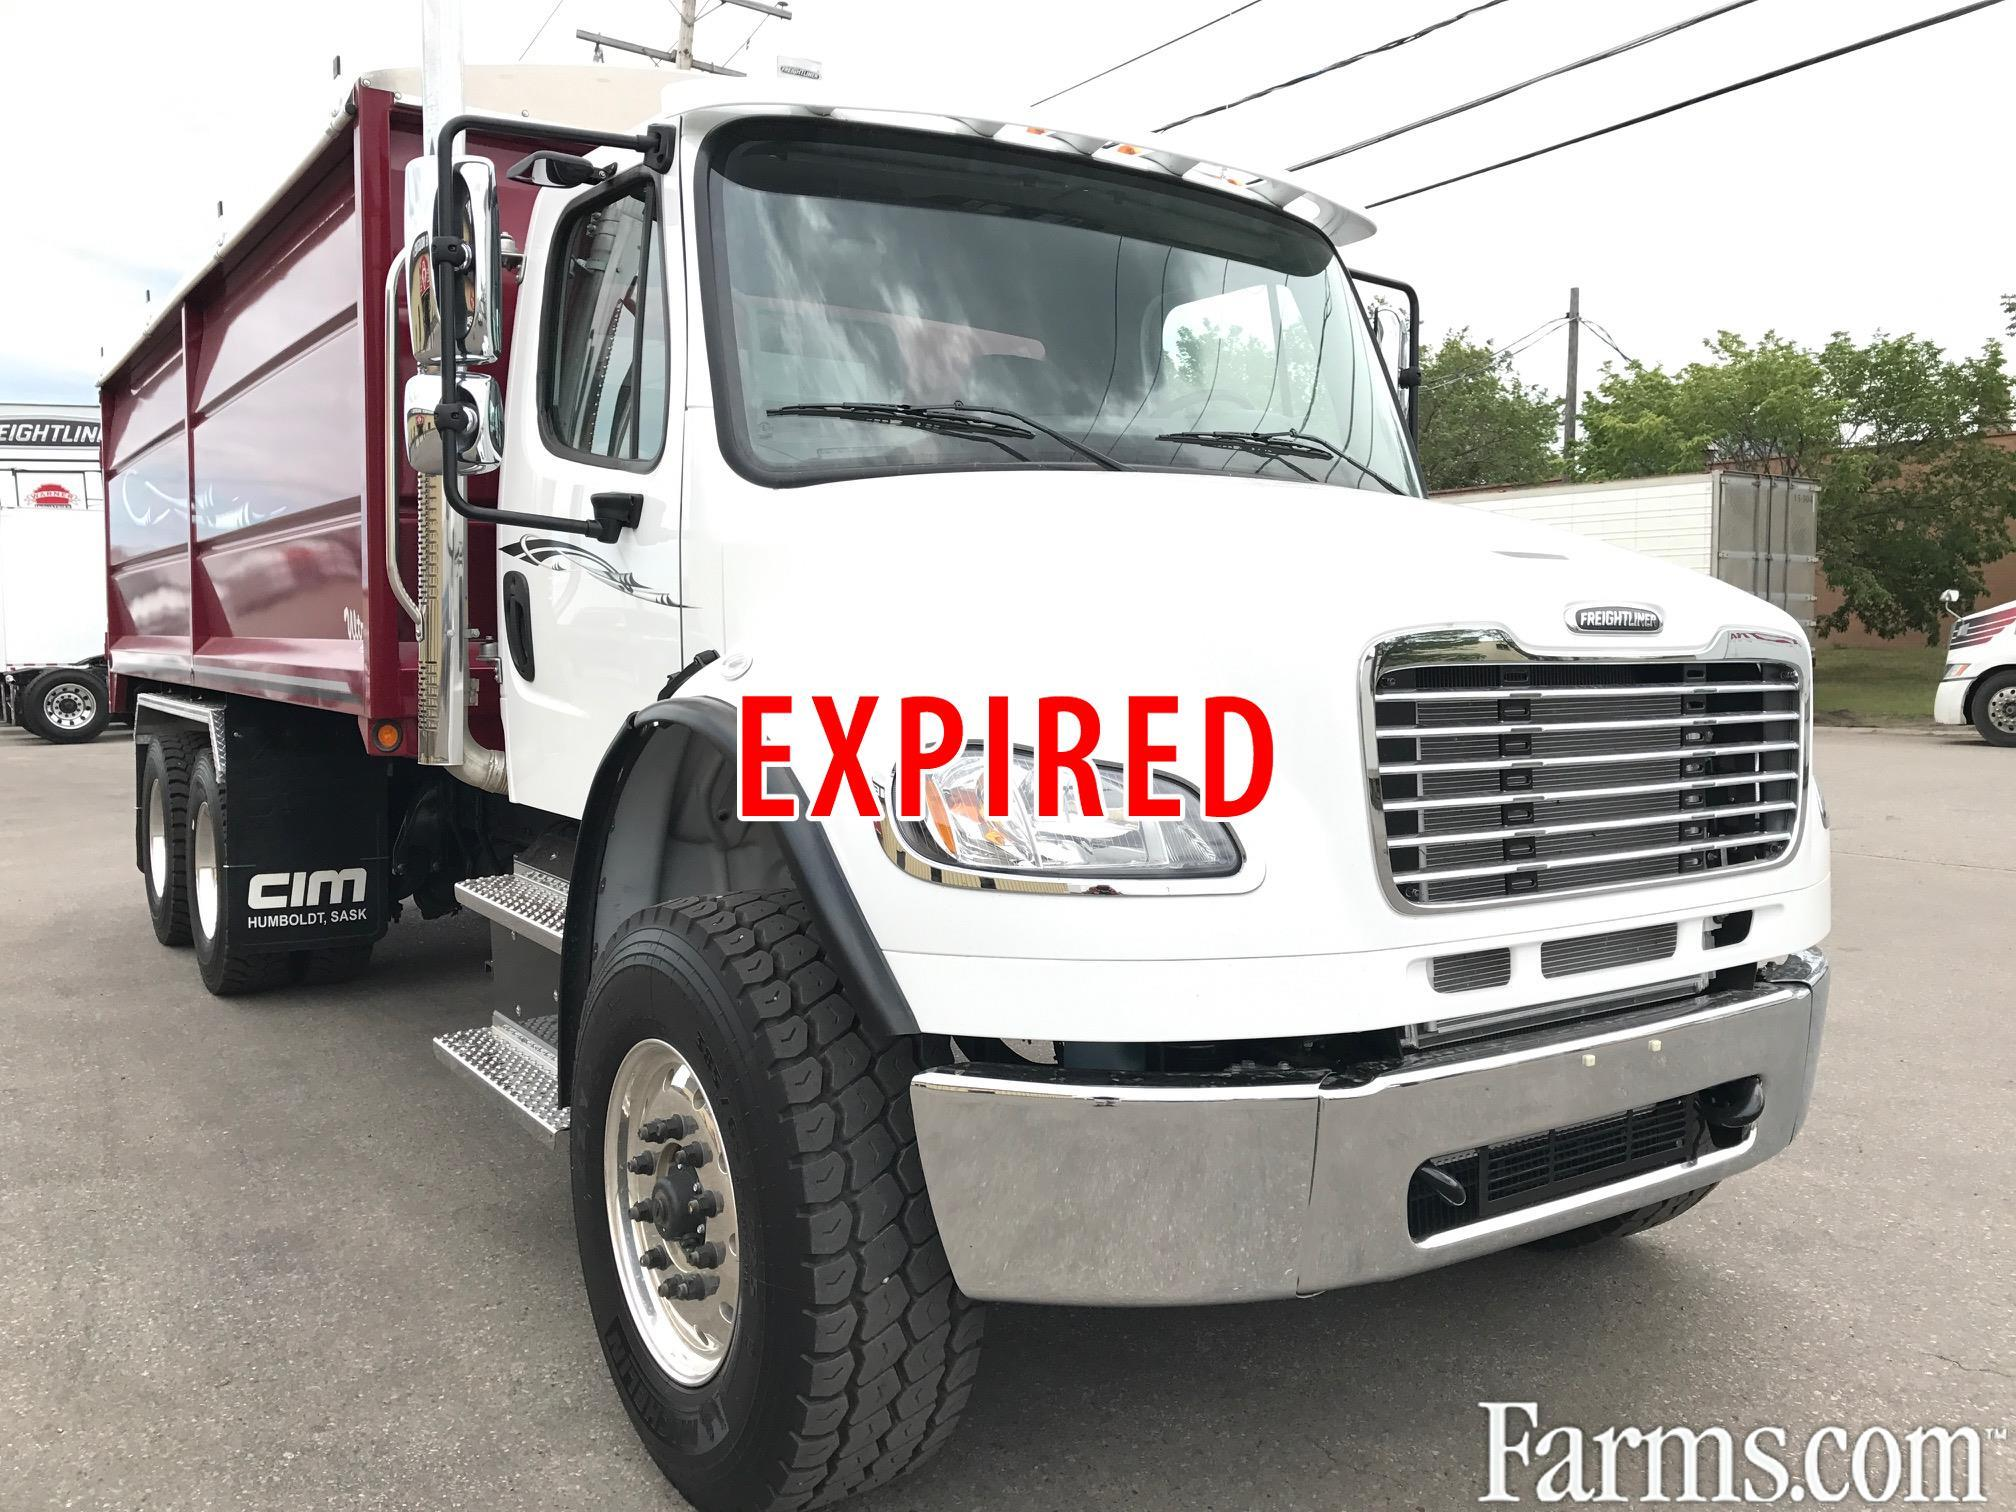 Freightliner 2018 M2 106 Farm / Grain Trucks - Heavy Duty